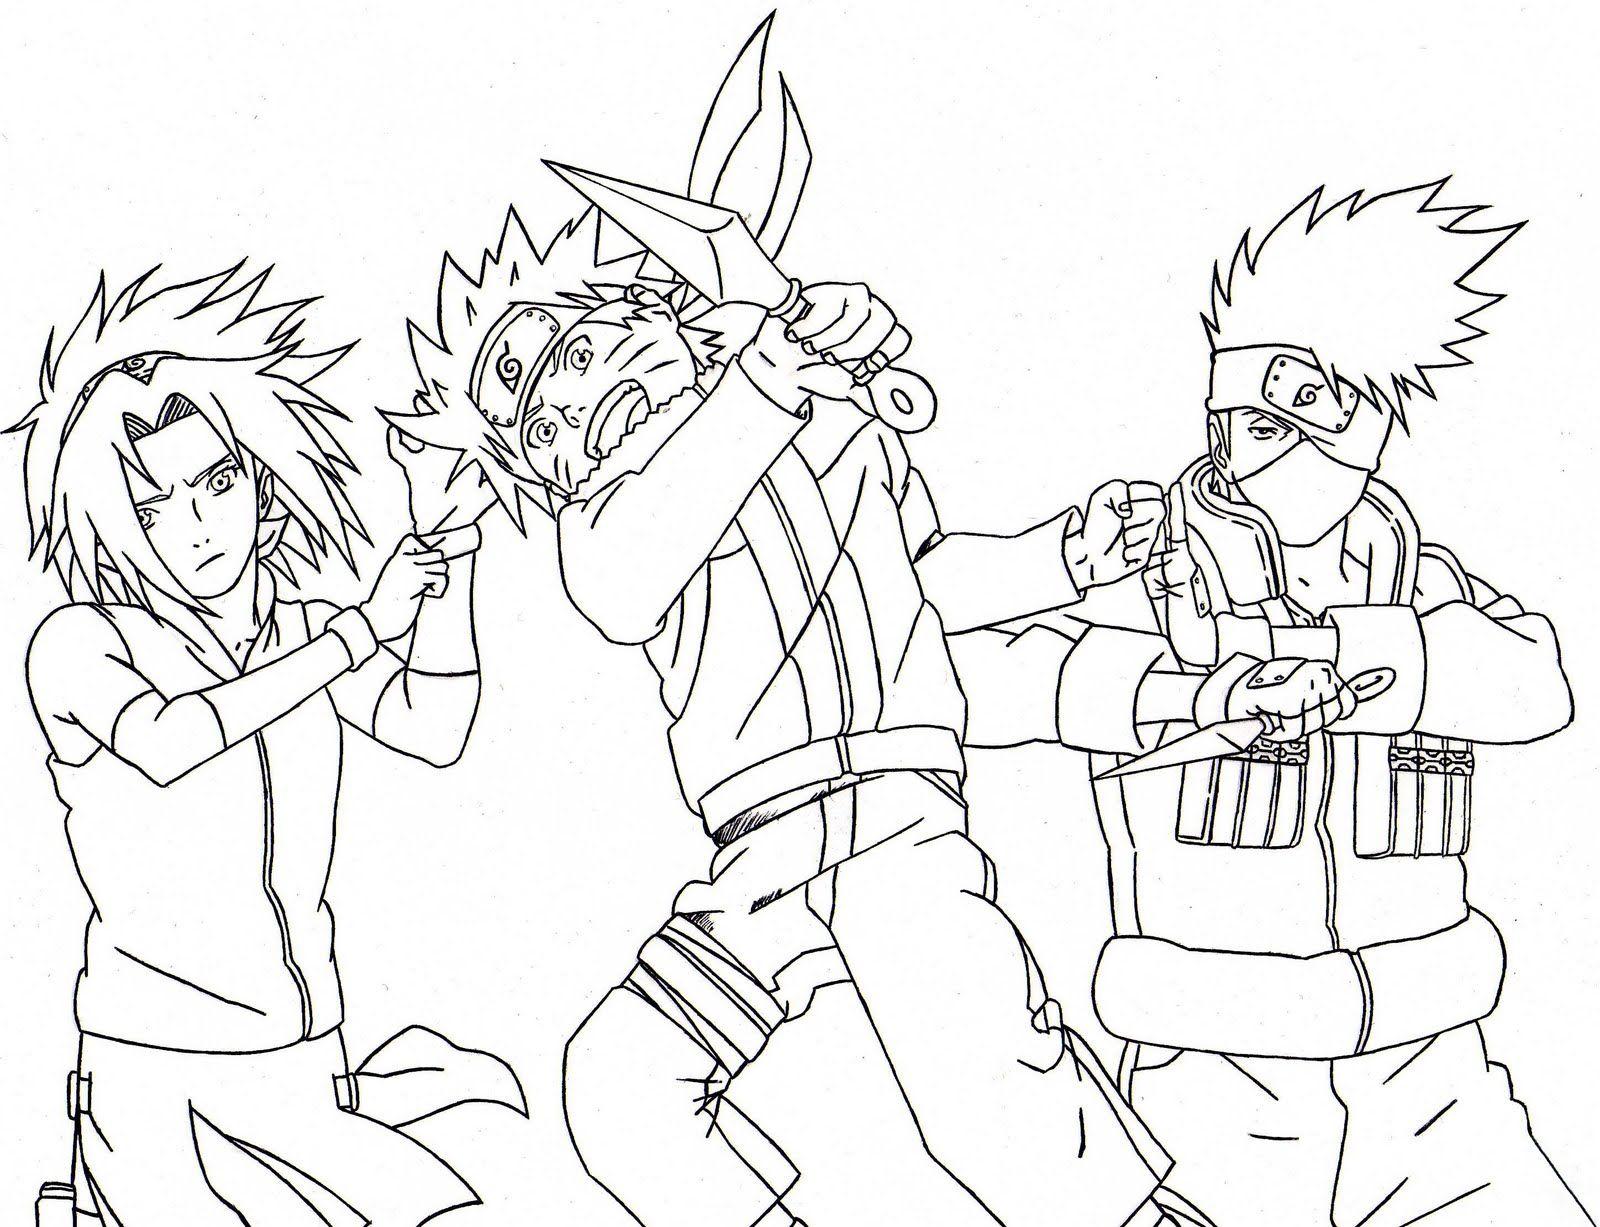 Dibujos De Kakashi Para Colorear: Dibujos De Naruto Para Imprimir. Beautiful Dibujos De